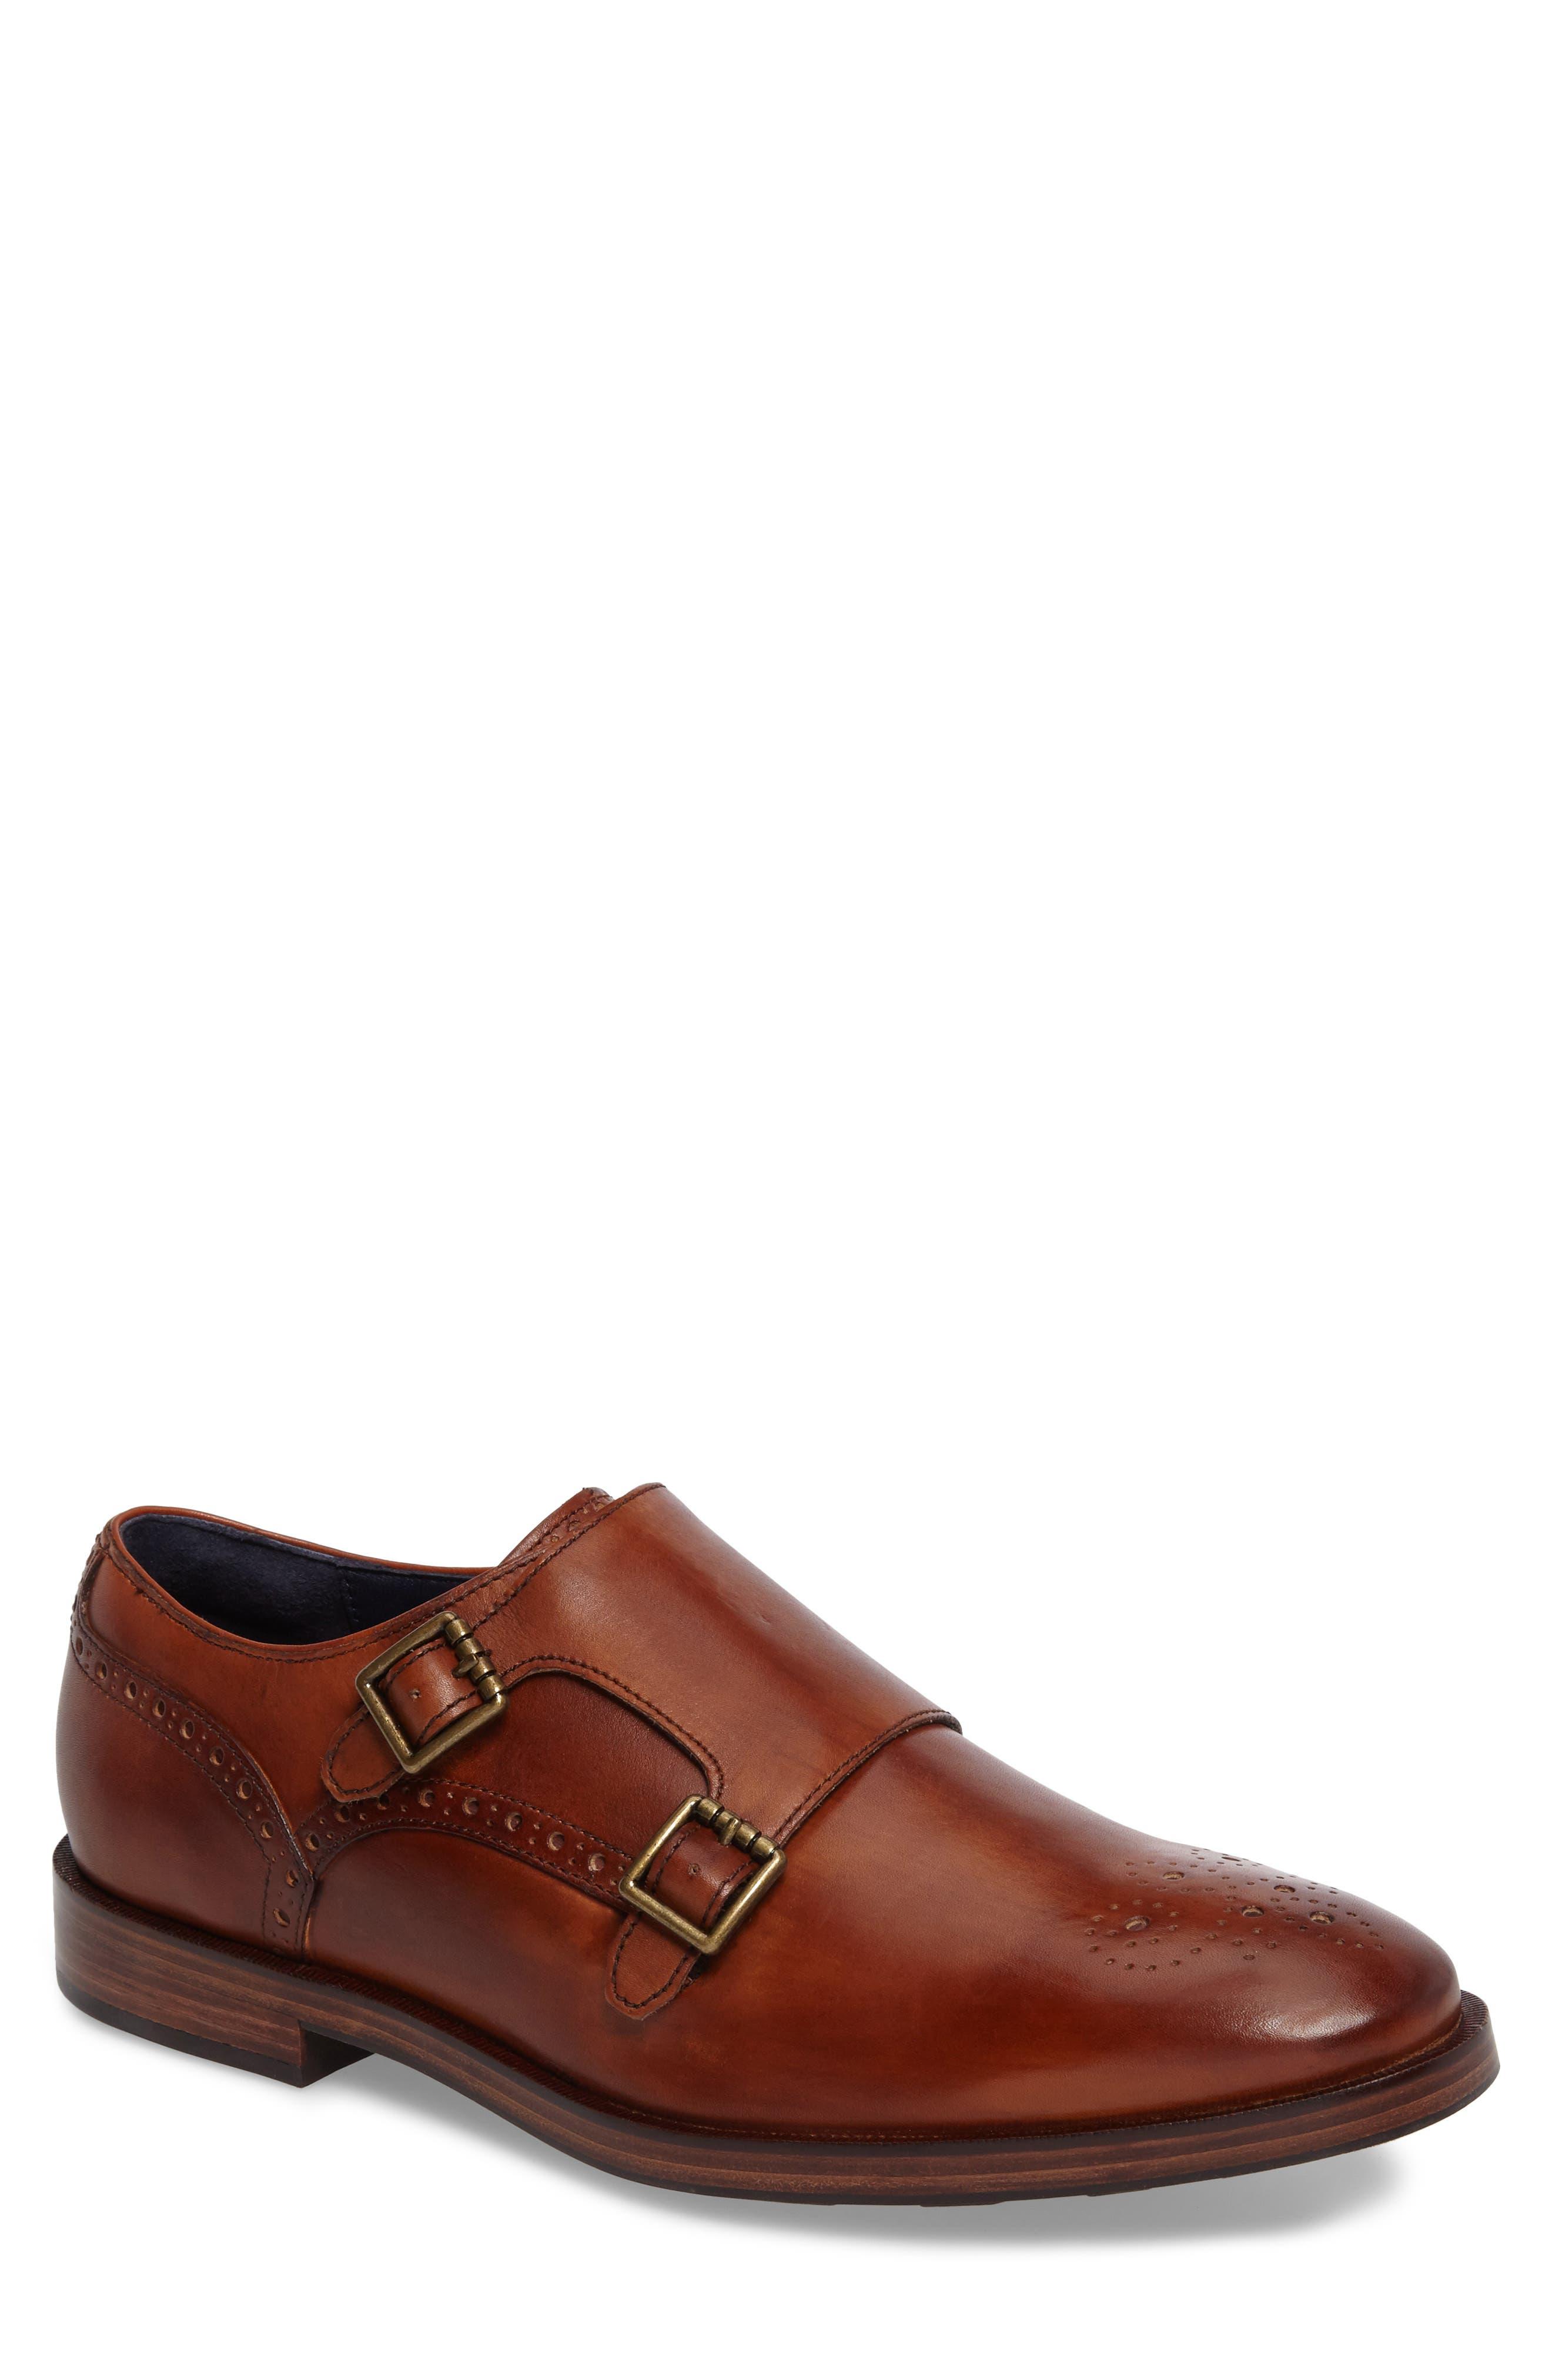 Hamilton Double Monk Strap Shoe,                         Main,                         color, British Tan Leather